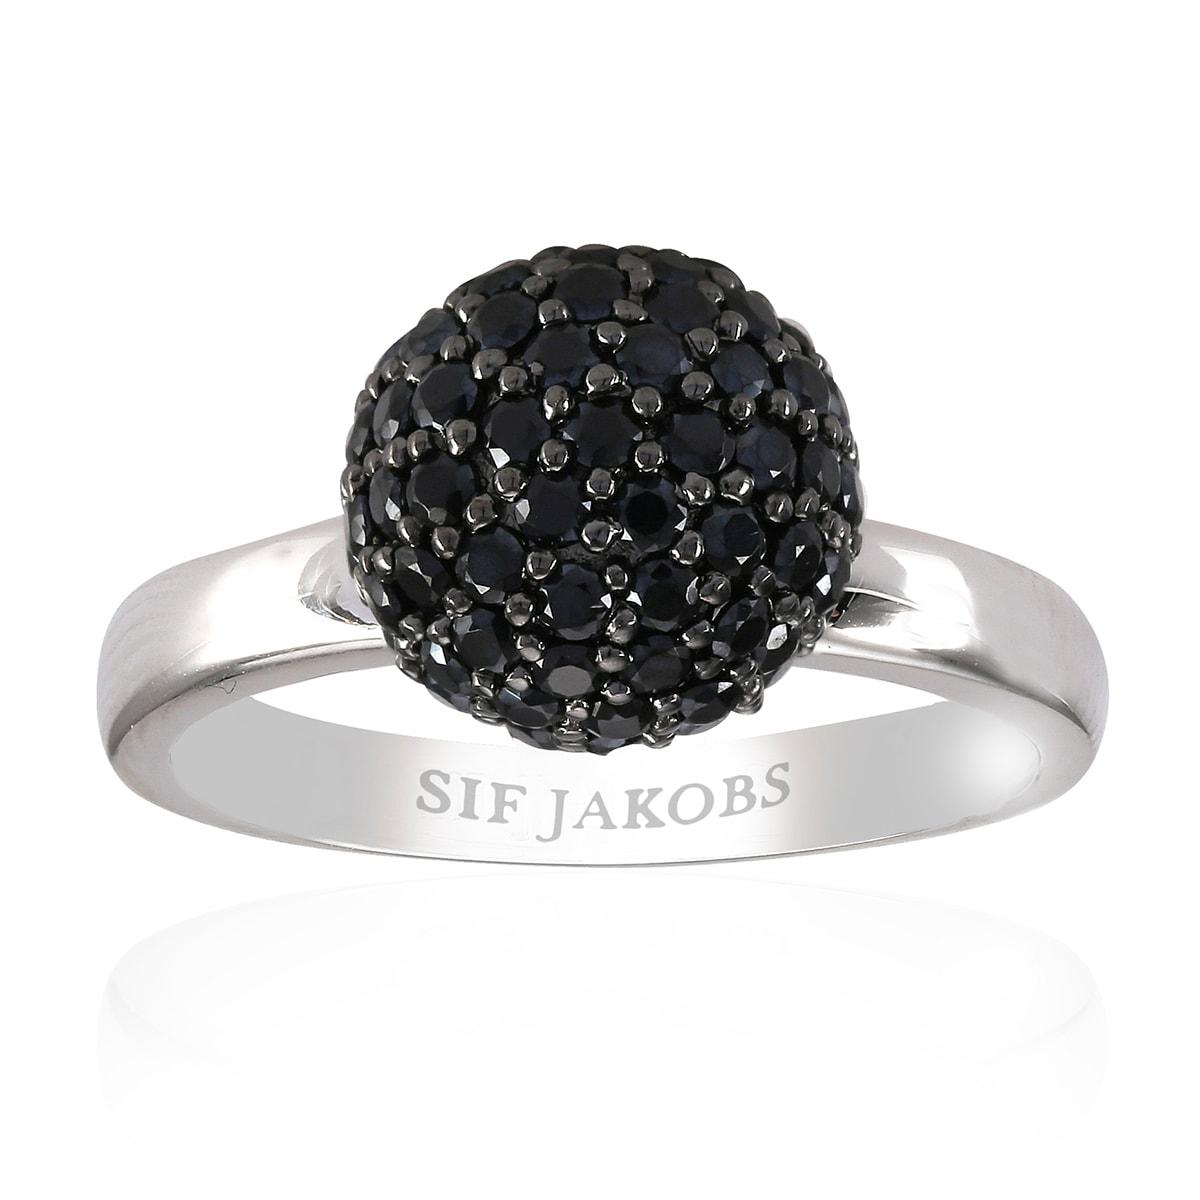 Sif_Jakobs_Bobbio_ring_SJ-R10680-BK_hos_jarl_sandin